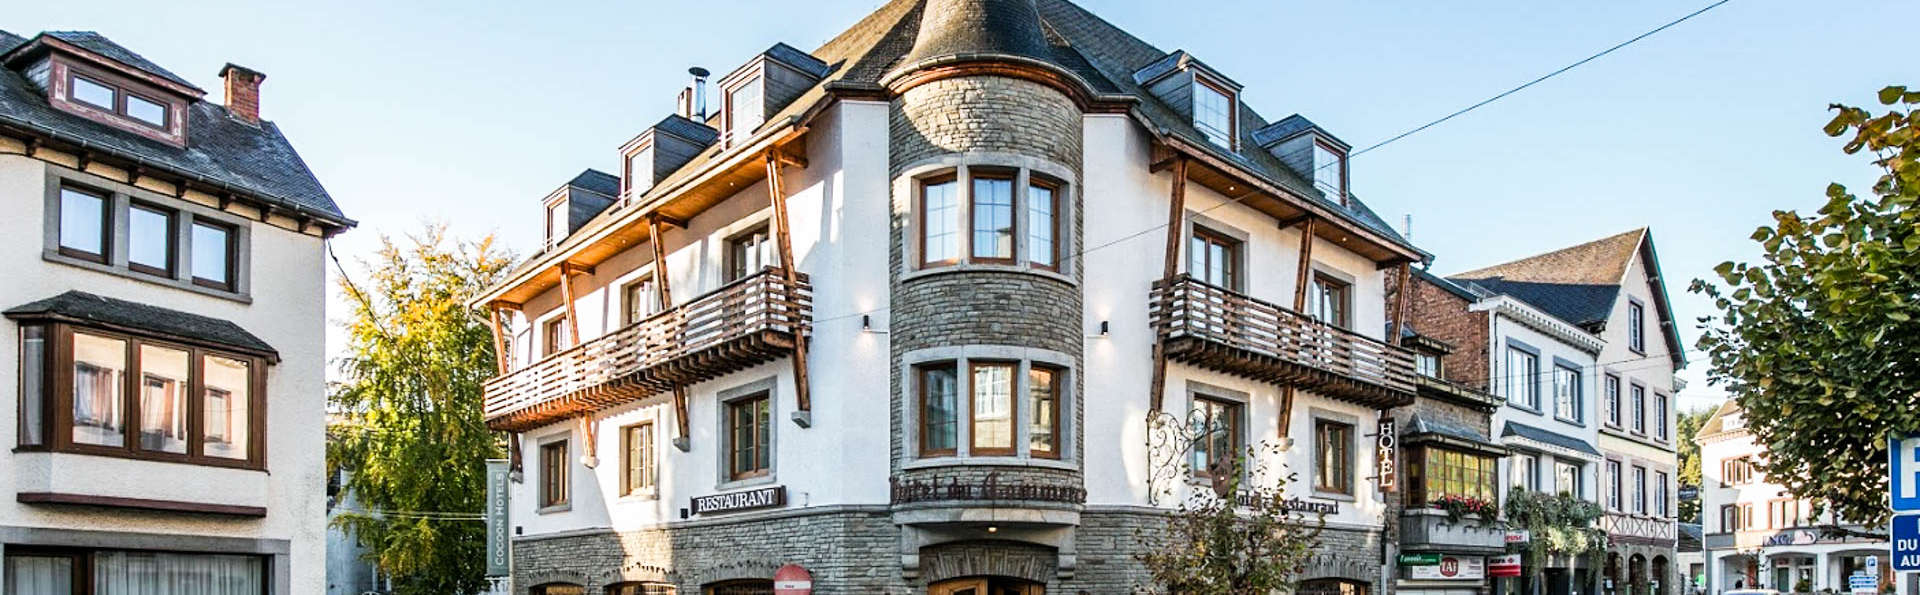 Cocoon Hôtel du Commerce - EDIT_NEW_FRONT.jpg